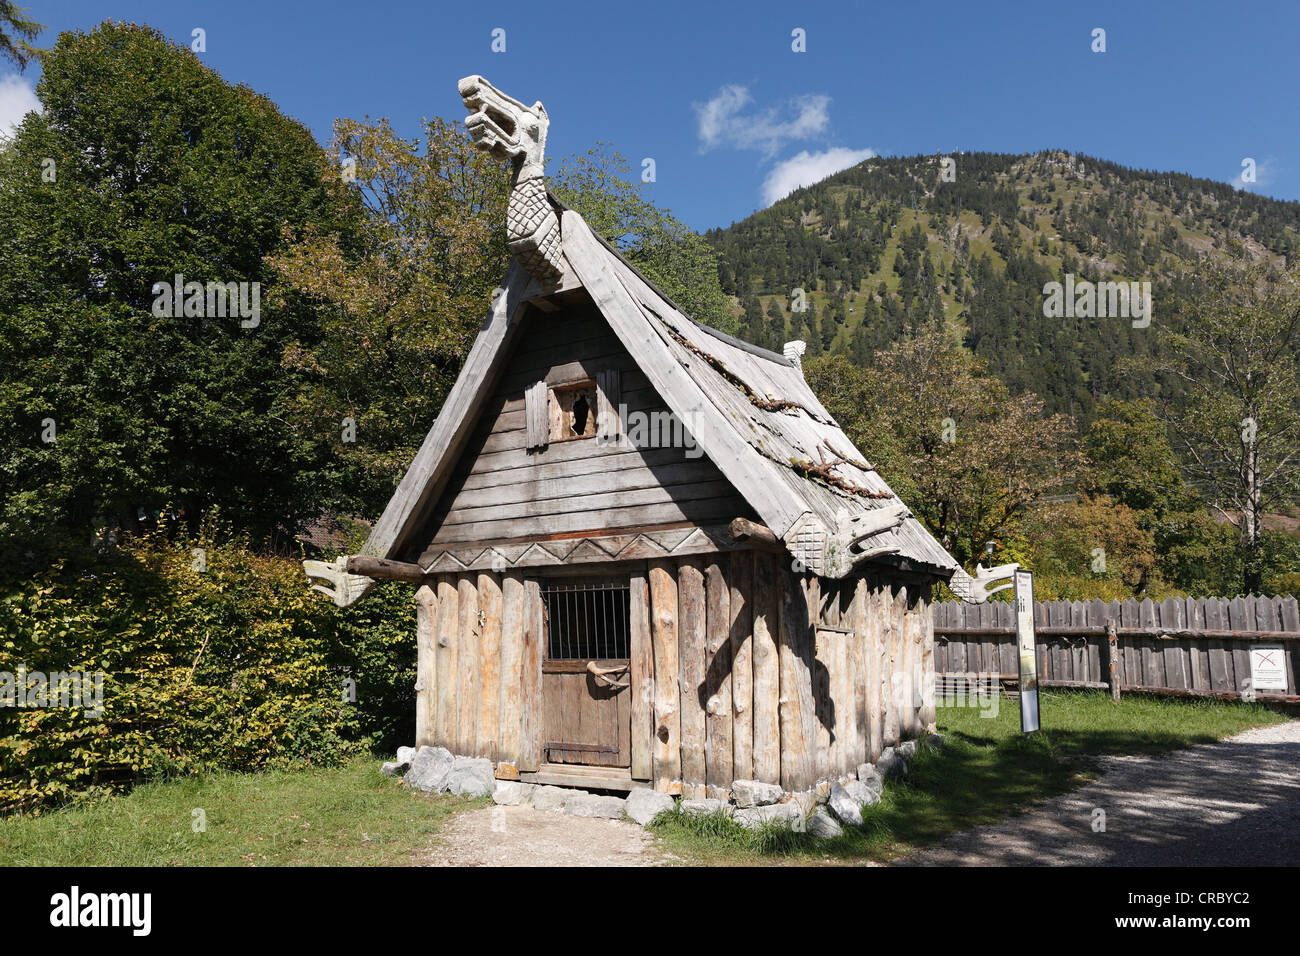 Wooden hut at the Flake Viking village on Lake Walchen, Herzogstand mountain at the back, Upper Bavaria, Bavaria - Stock Image